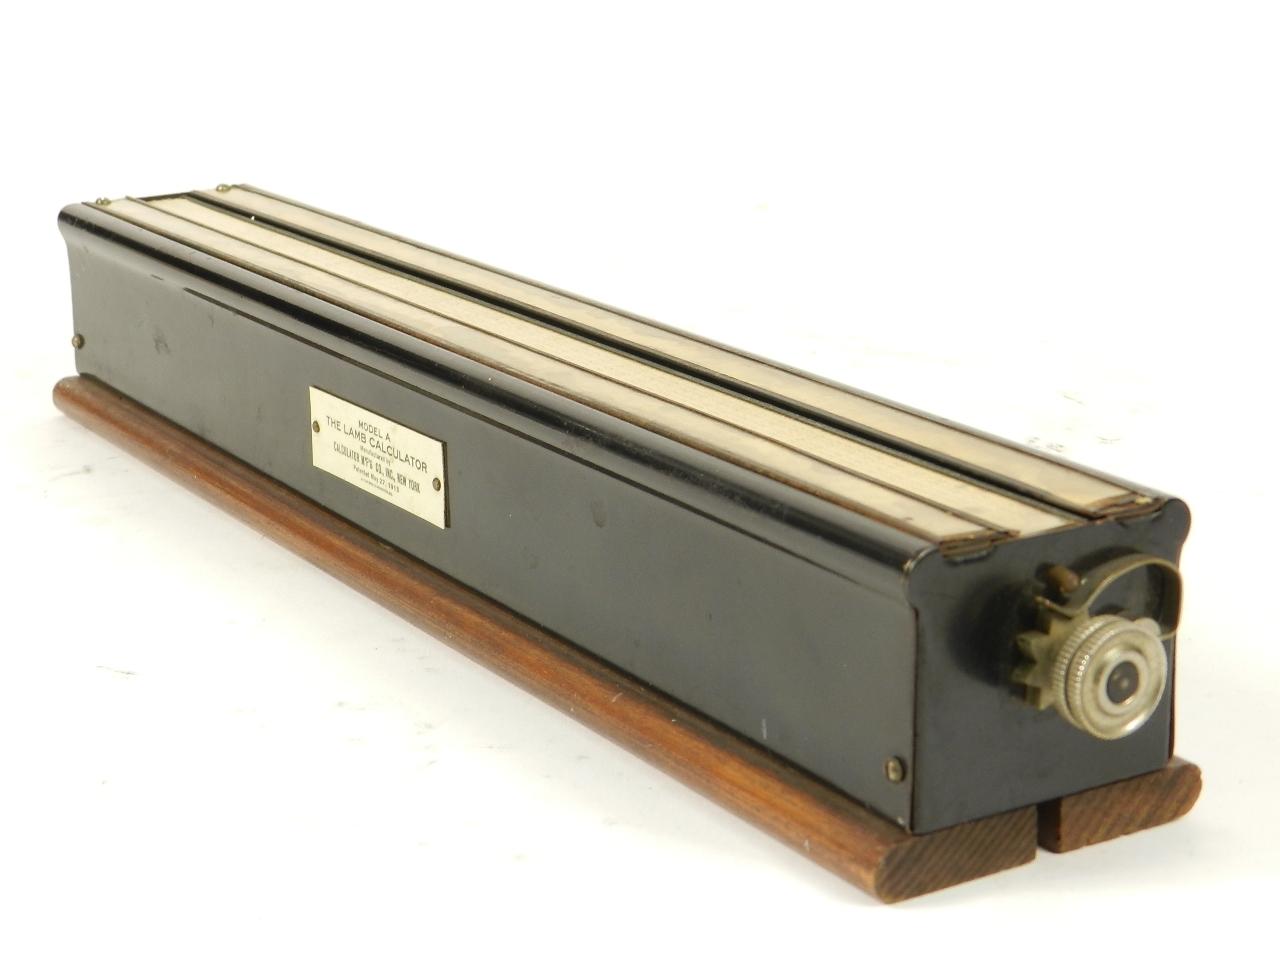 Imagen THE LAMB CALCULATOR AÑO 1913 31682